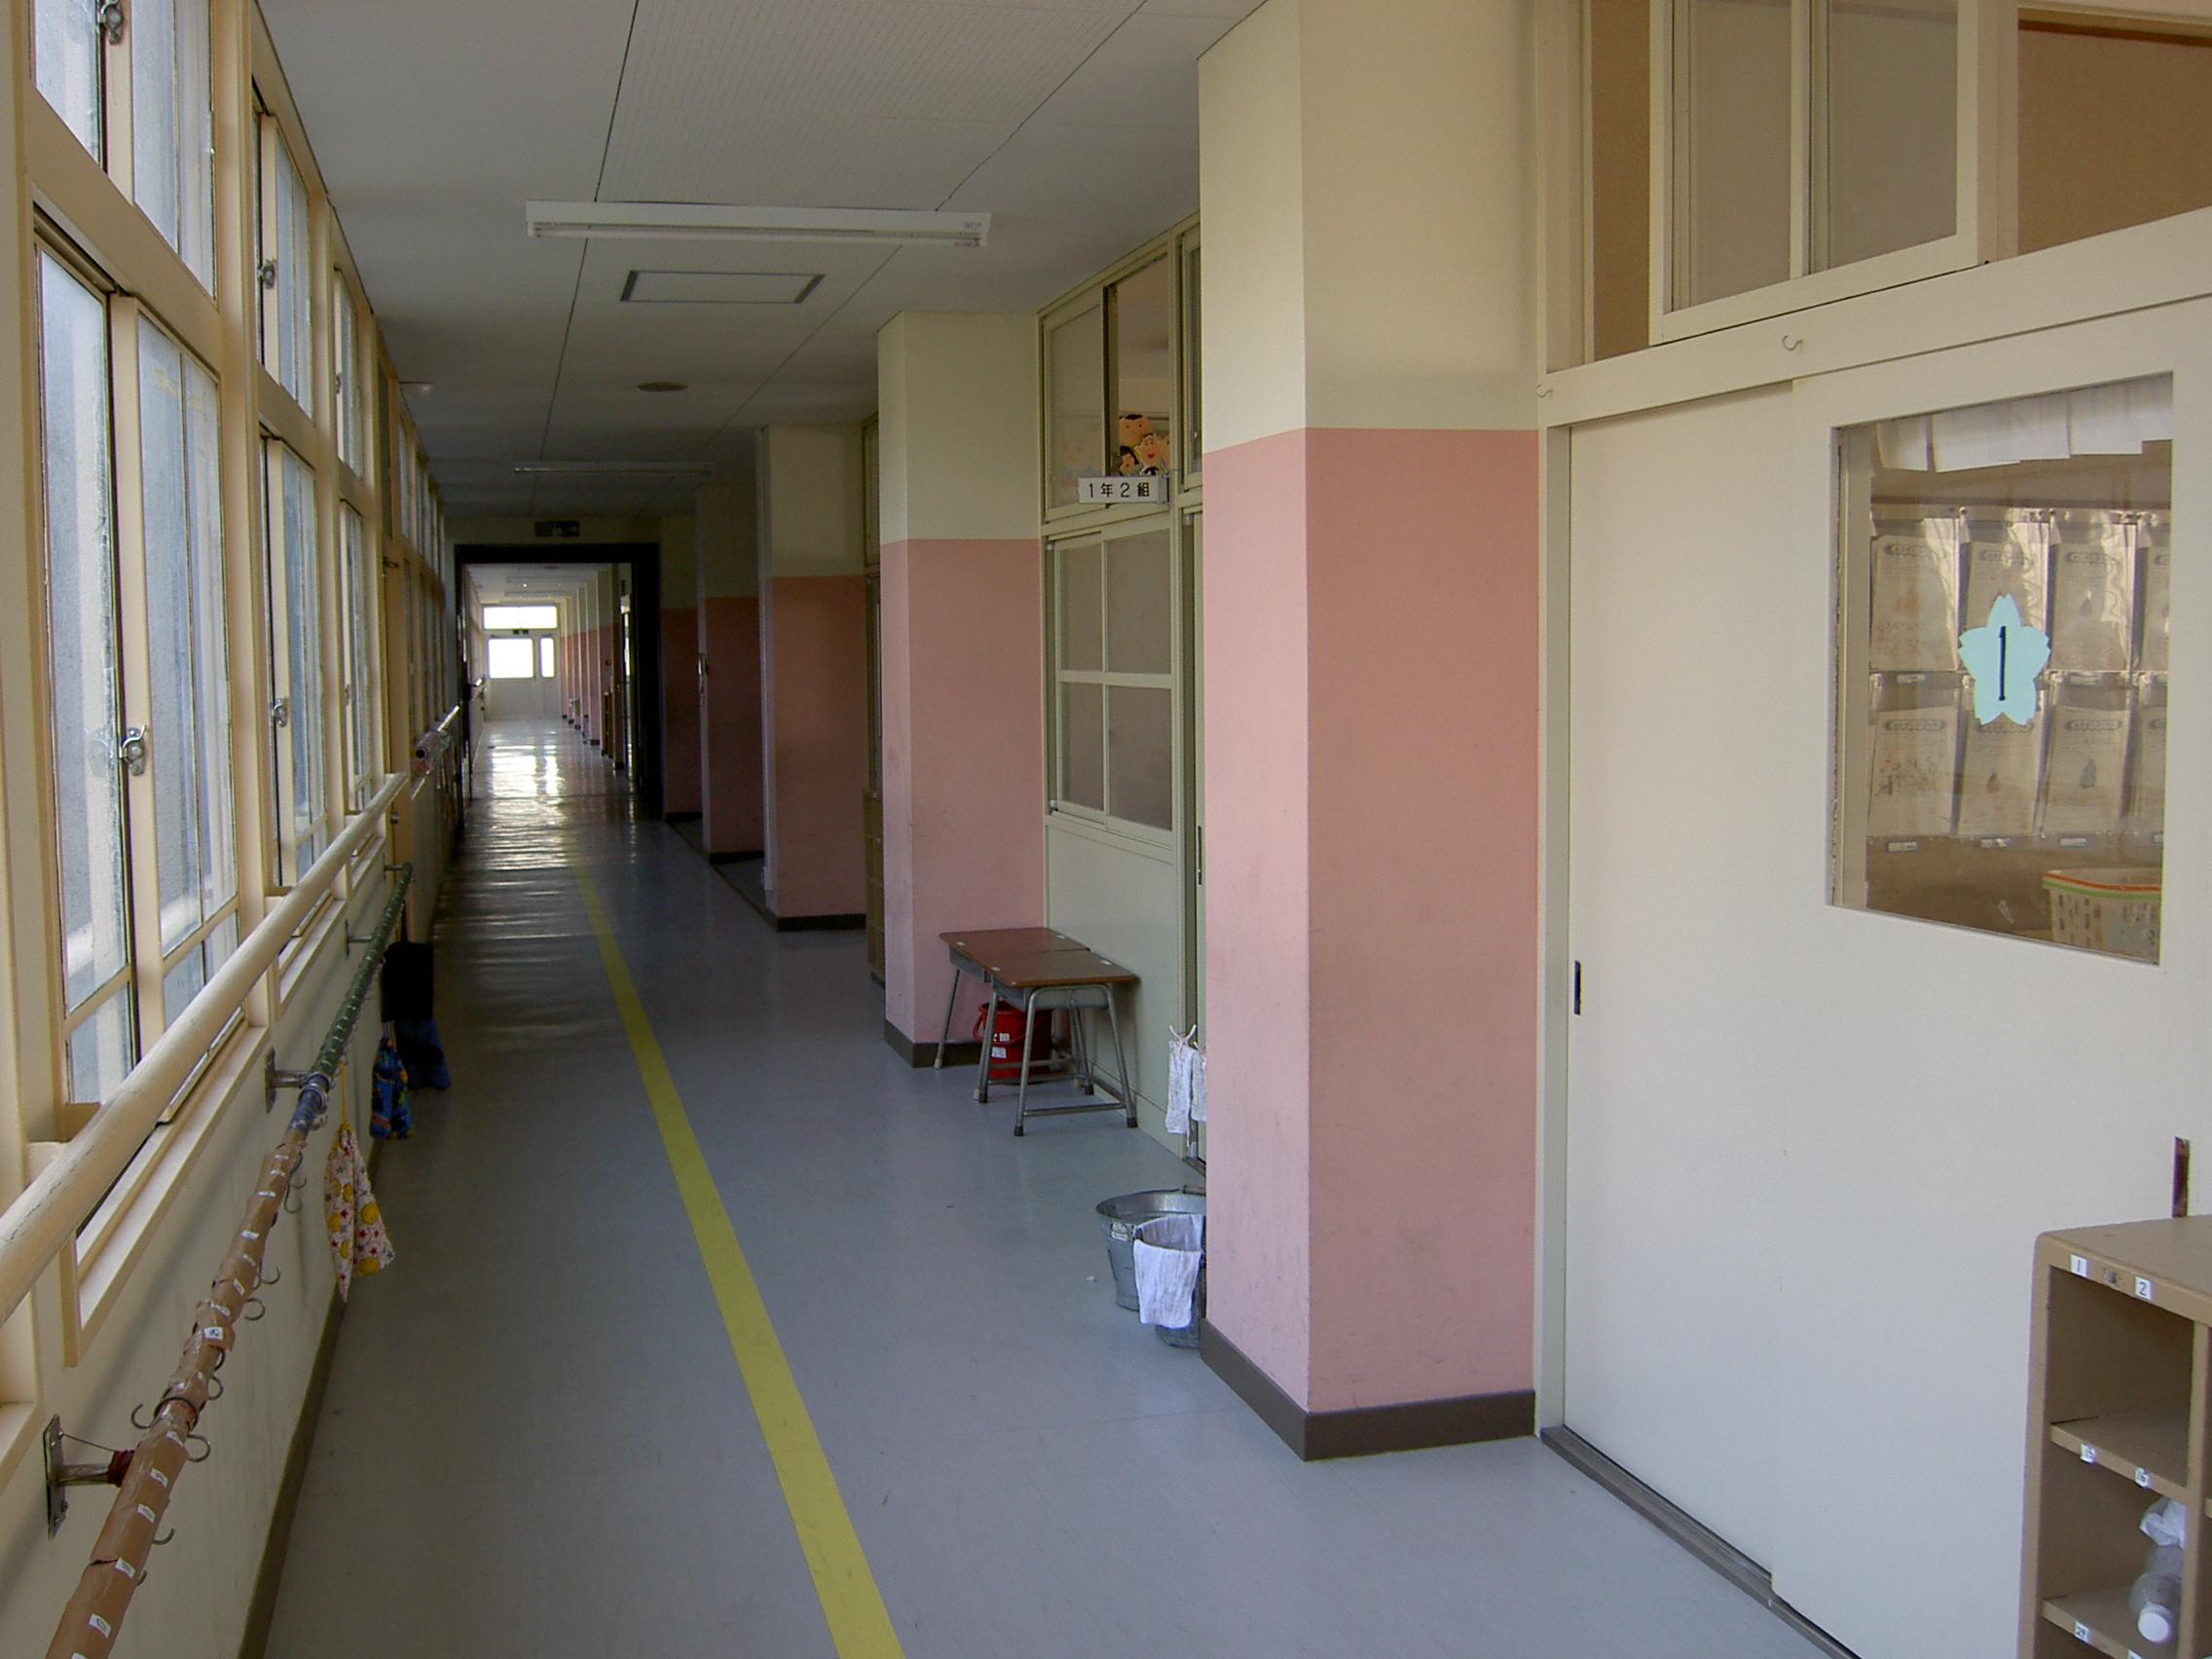 Corridor clipart classroom Elementary classroom File:Hirakata city a